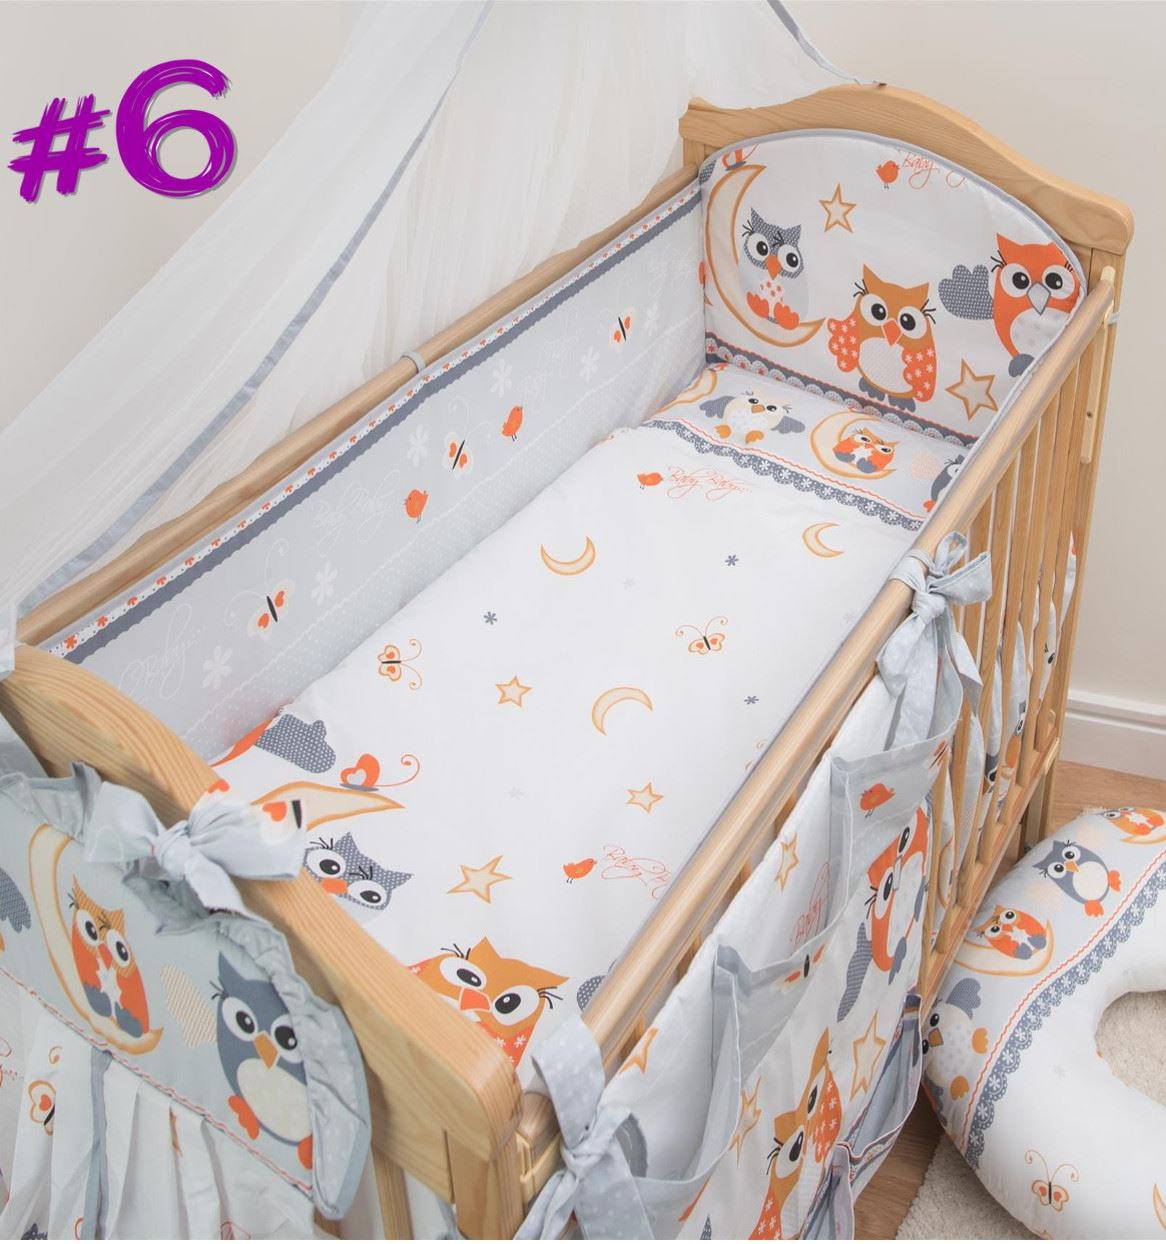 Cot bedding ... Image 2 of 2 LICBAIZ